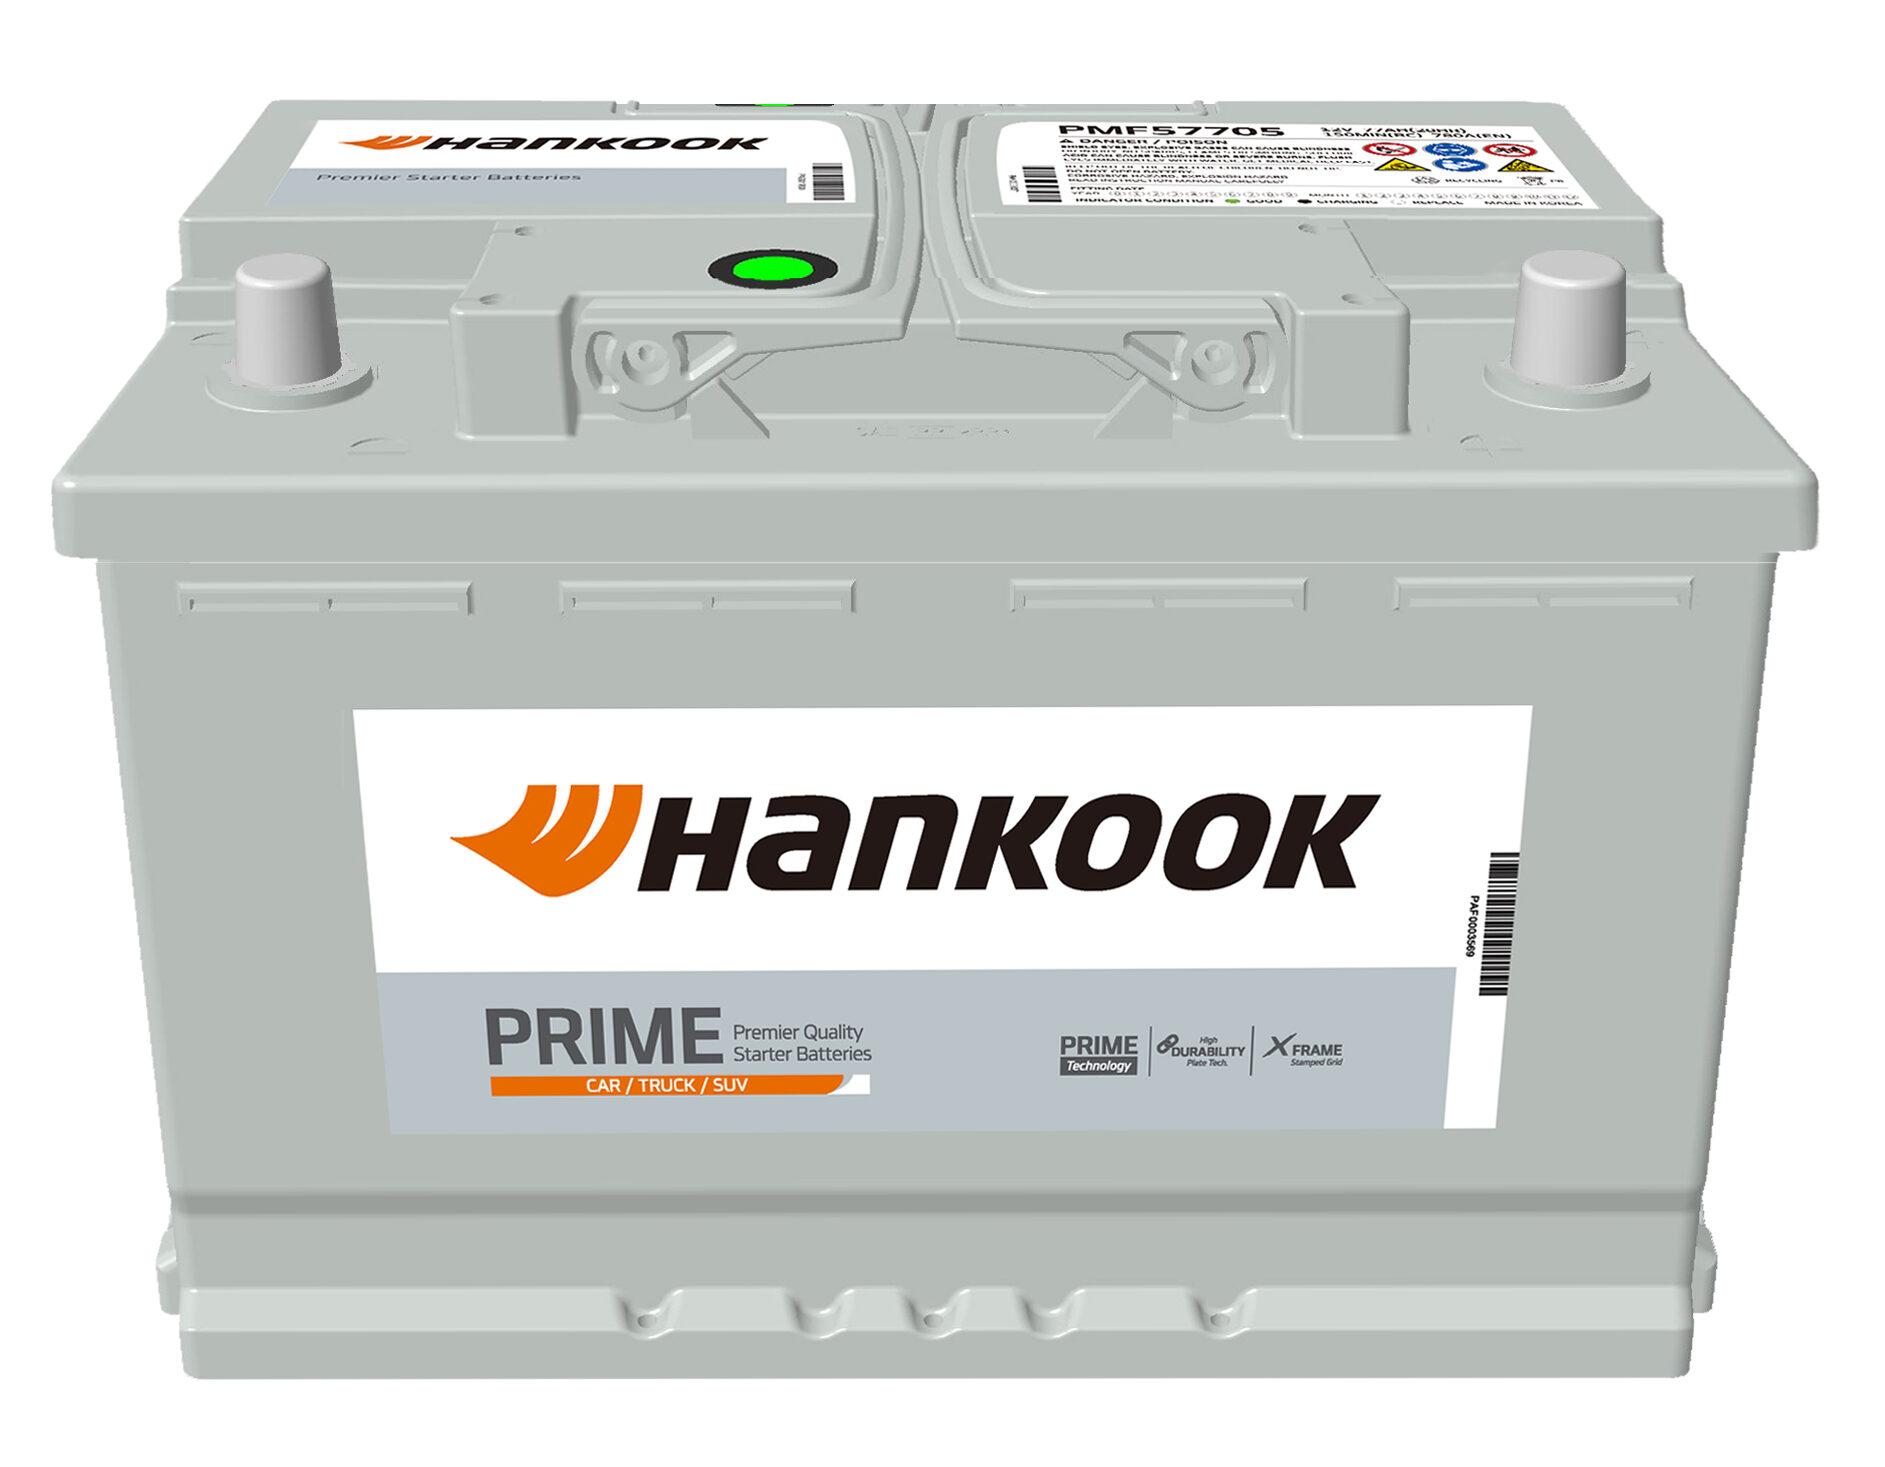 Hankook Prime